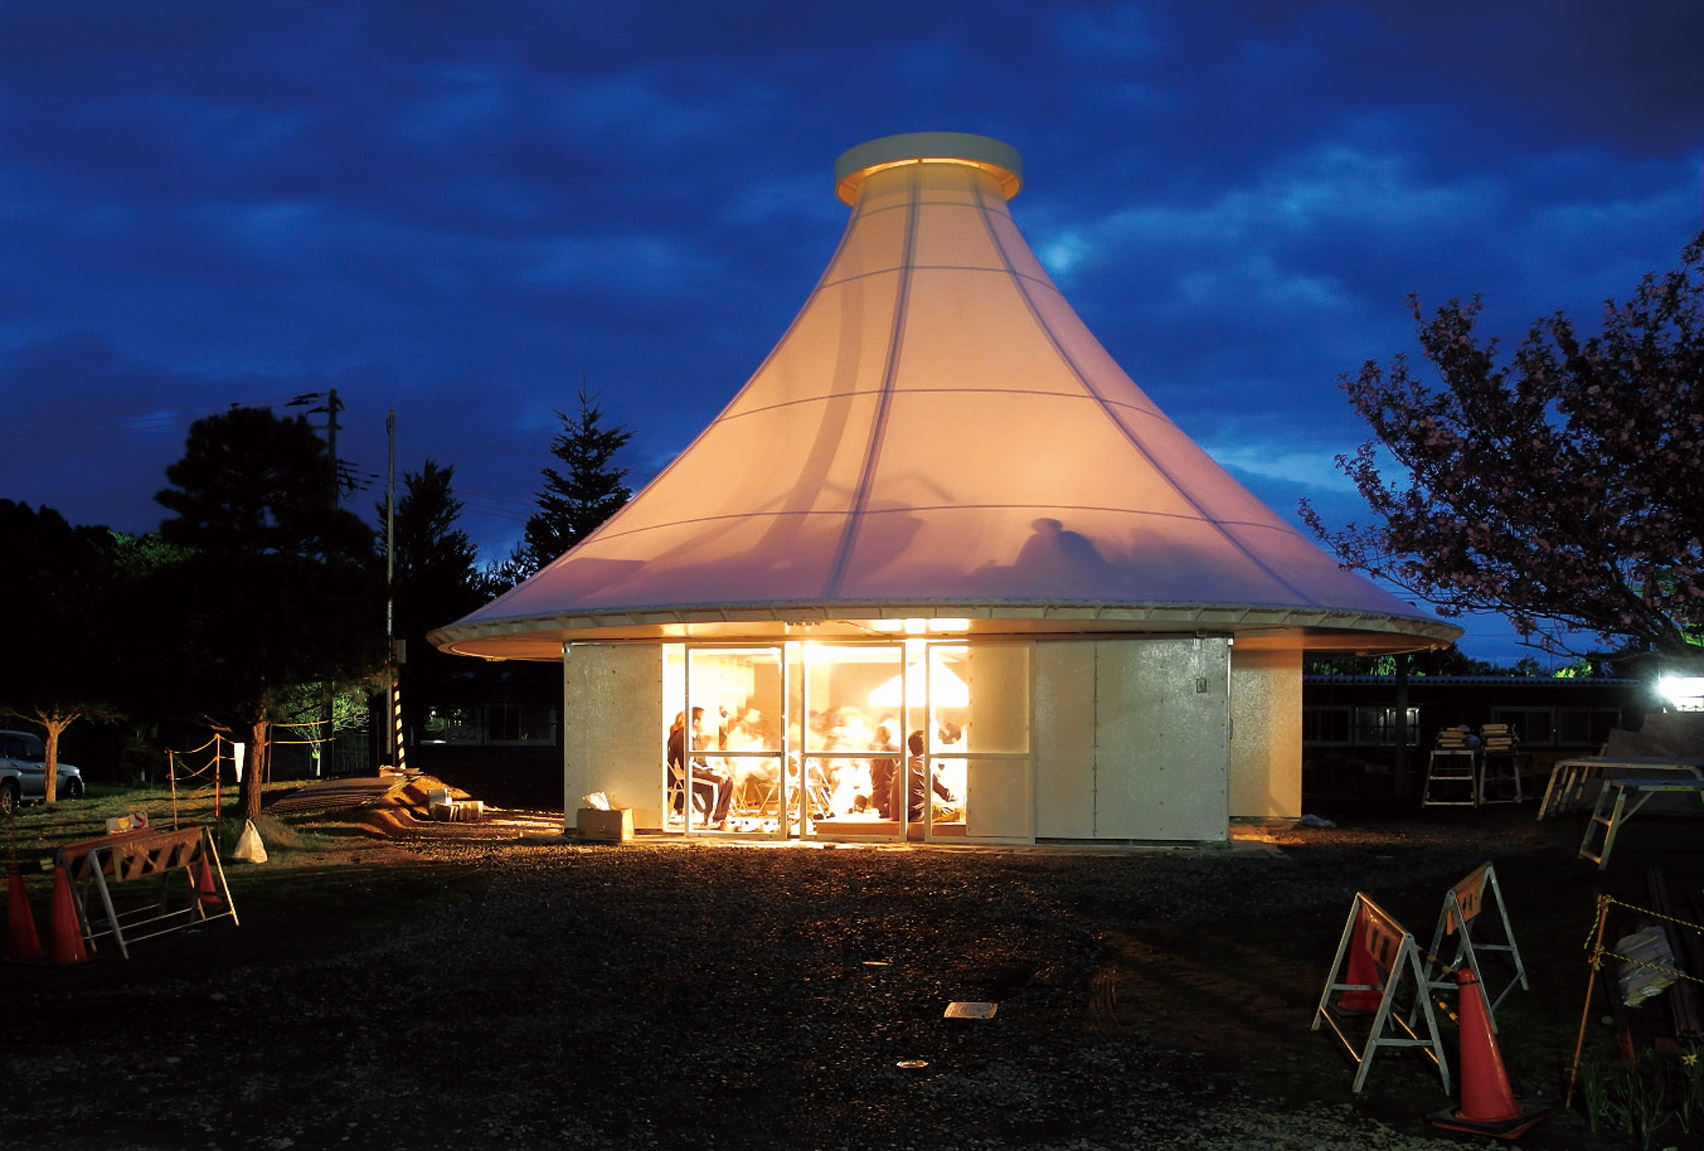 Shichigahama Home-for-All by Tetsuo Kondo Architects